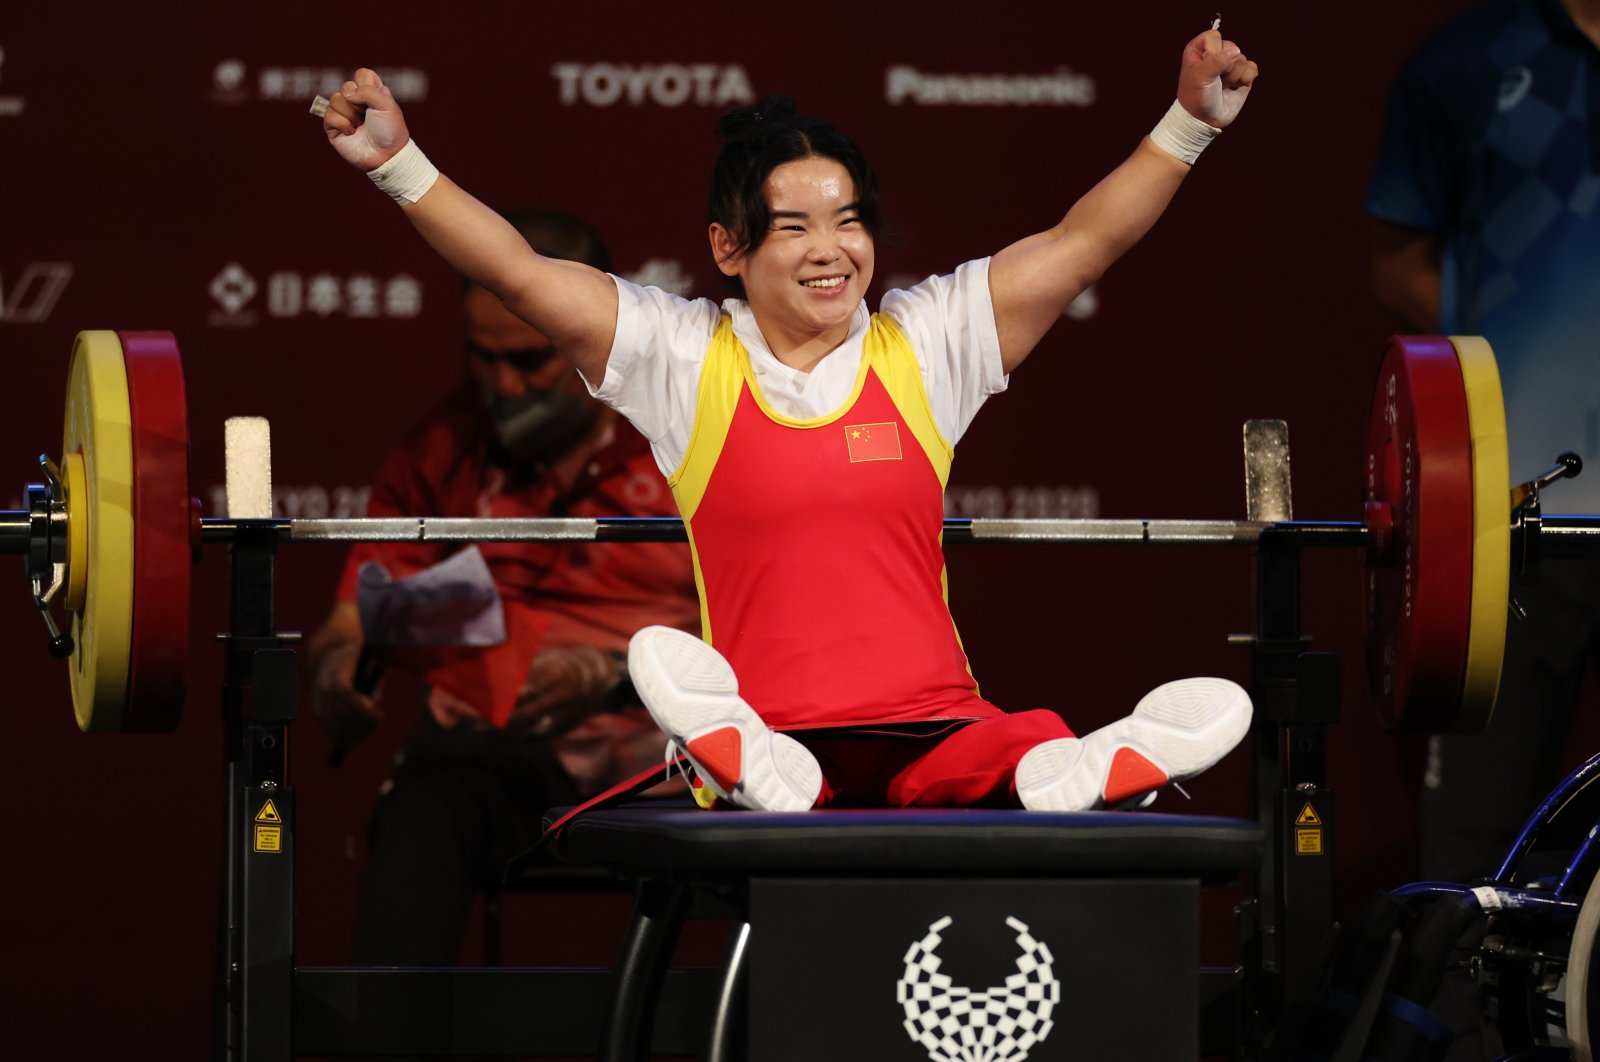 China's Guo Lingling celebrates winning women's 41-kilogram powerlifting gold at the Tokyo 2020 Paralympic Games, Tokyo, Japan, Aug. 26, 2021. (Reuters Photo)